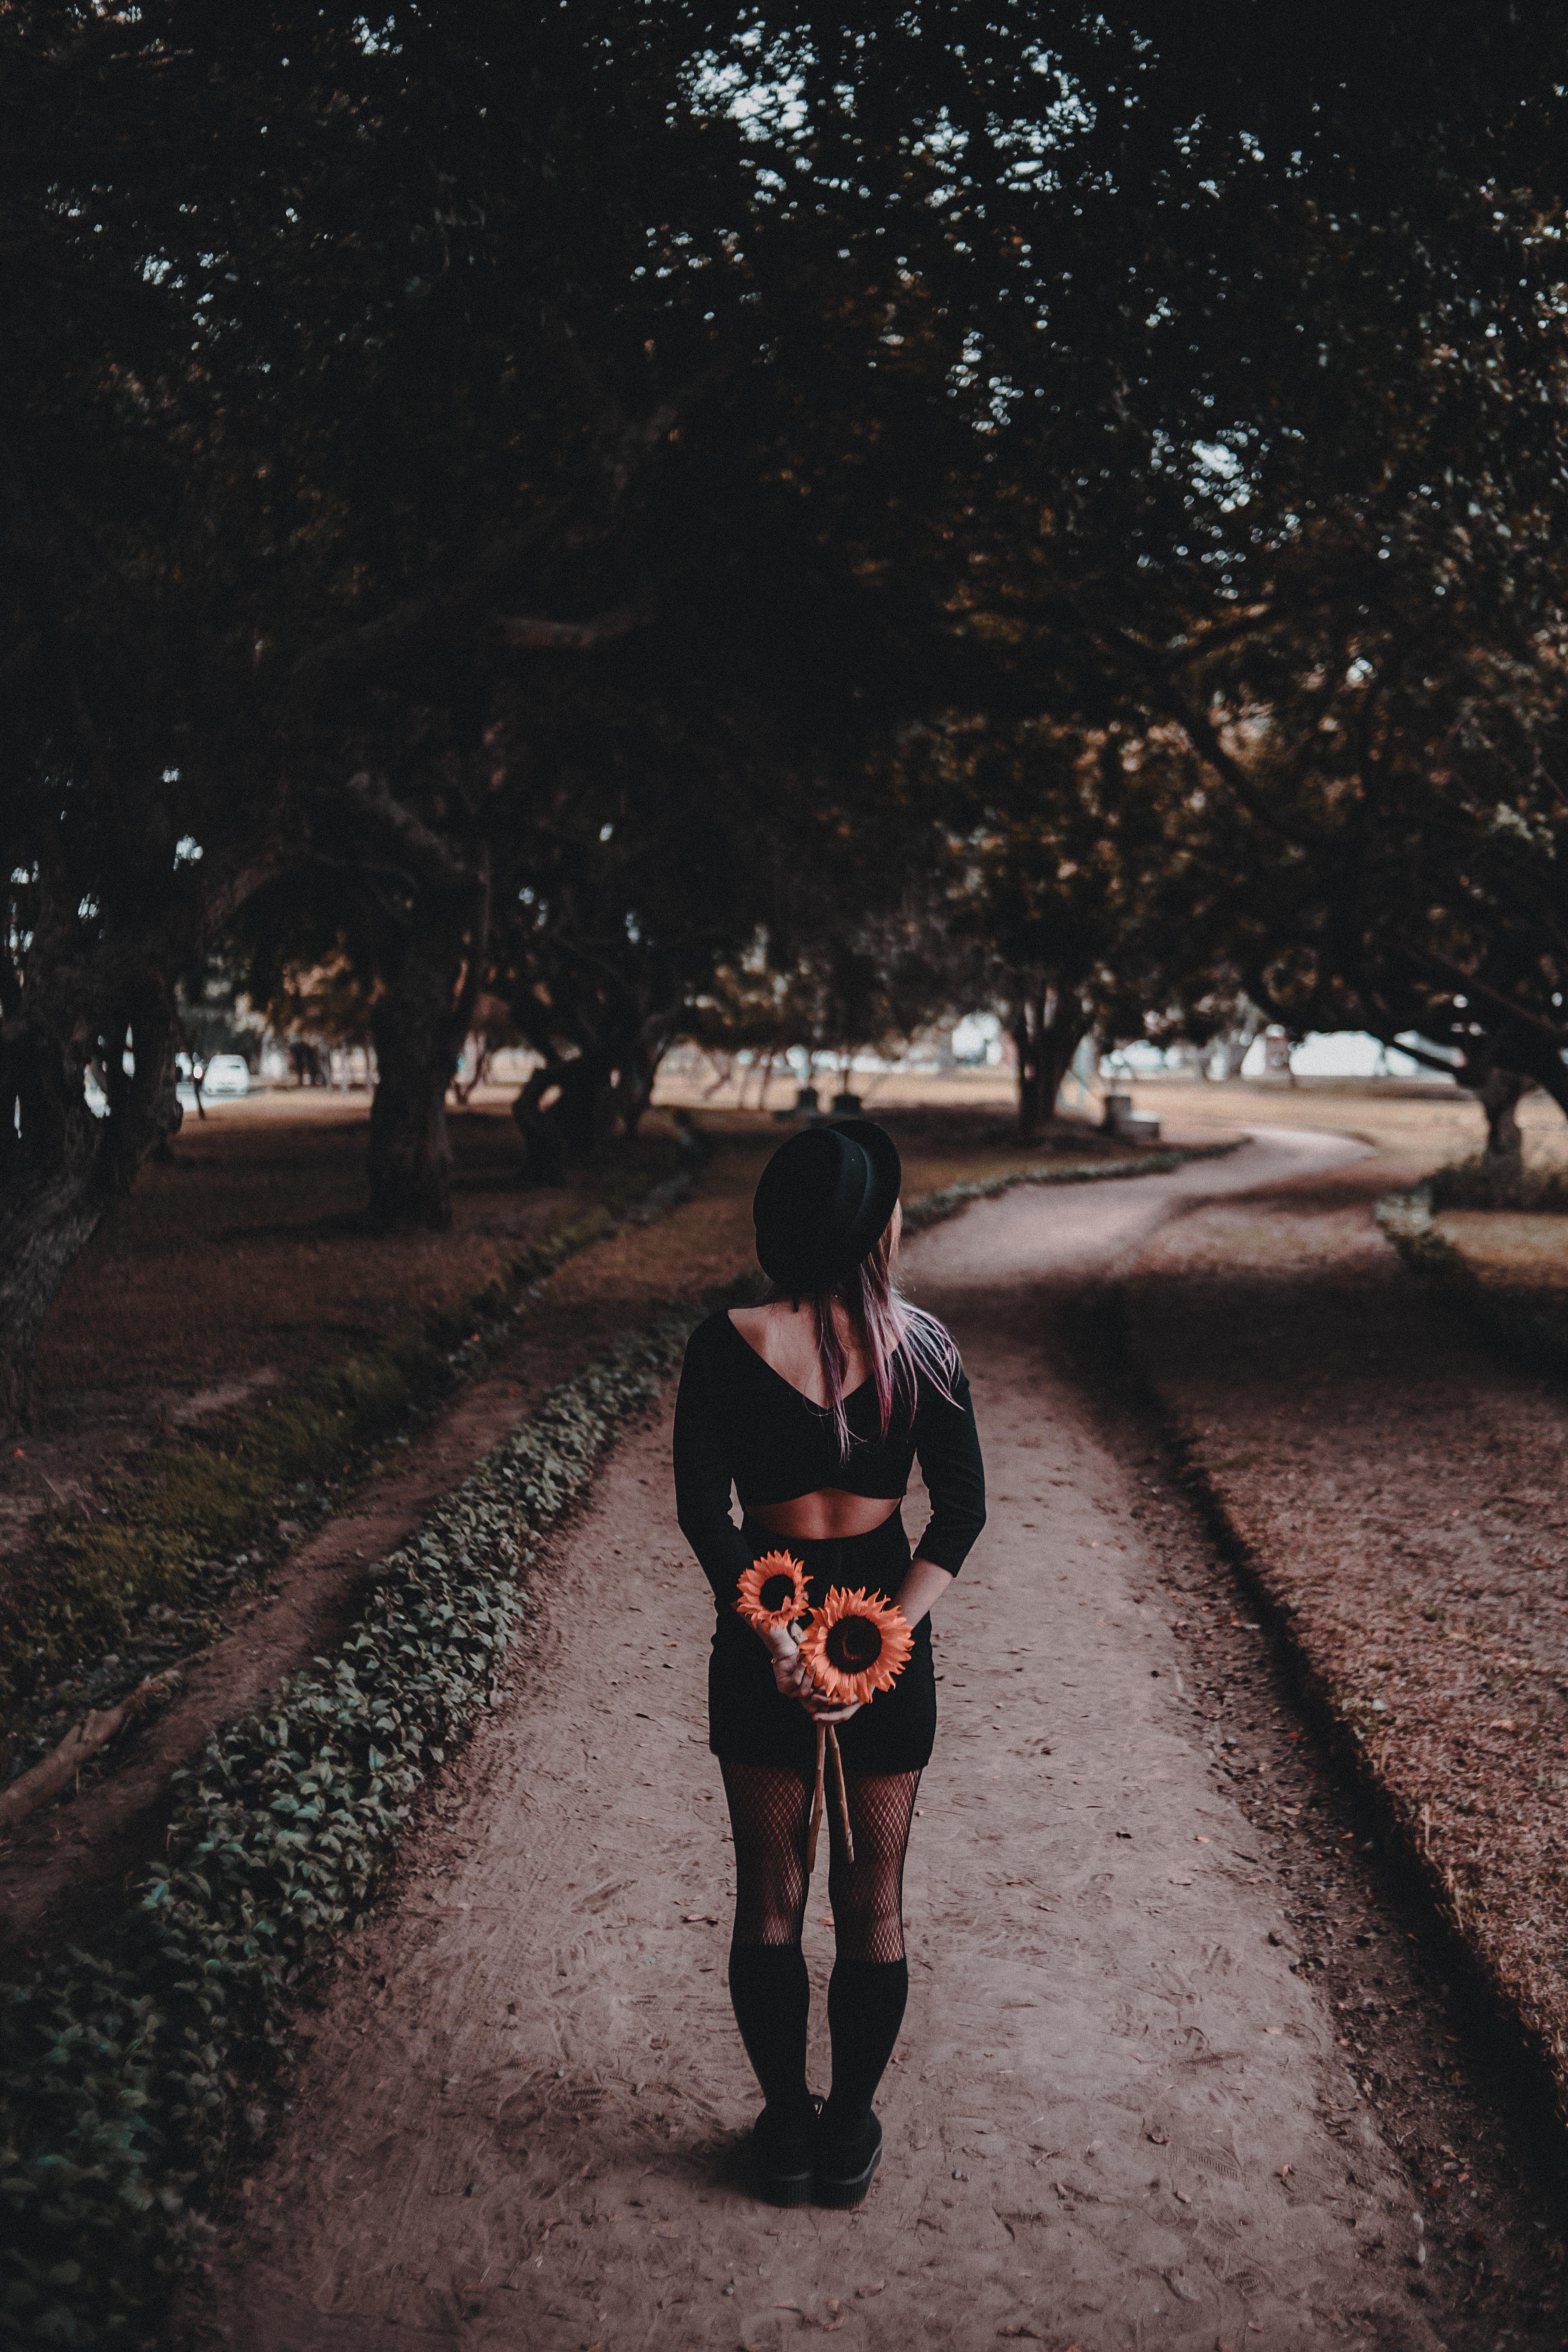 woman walking on park holding flower during daytime